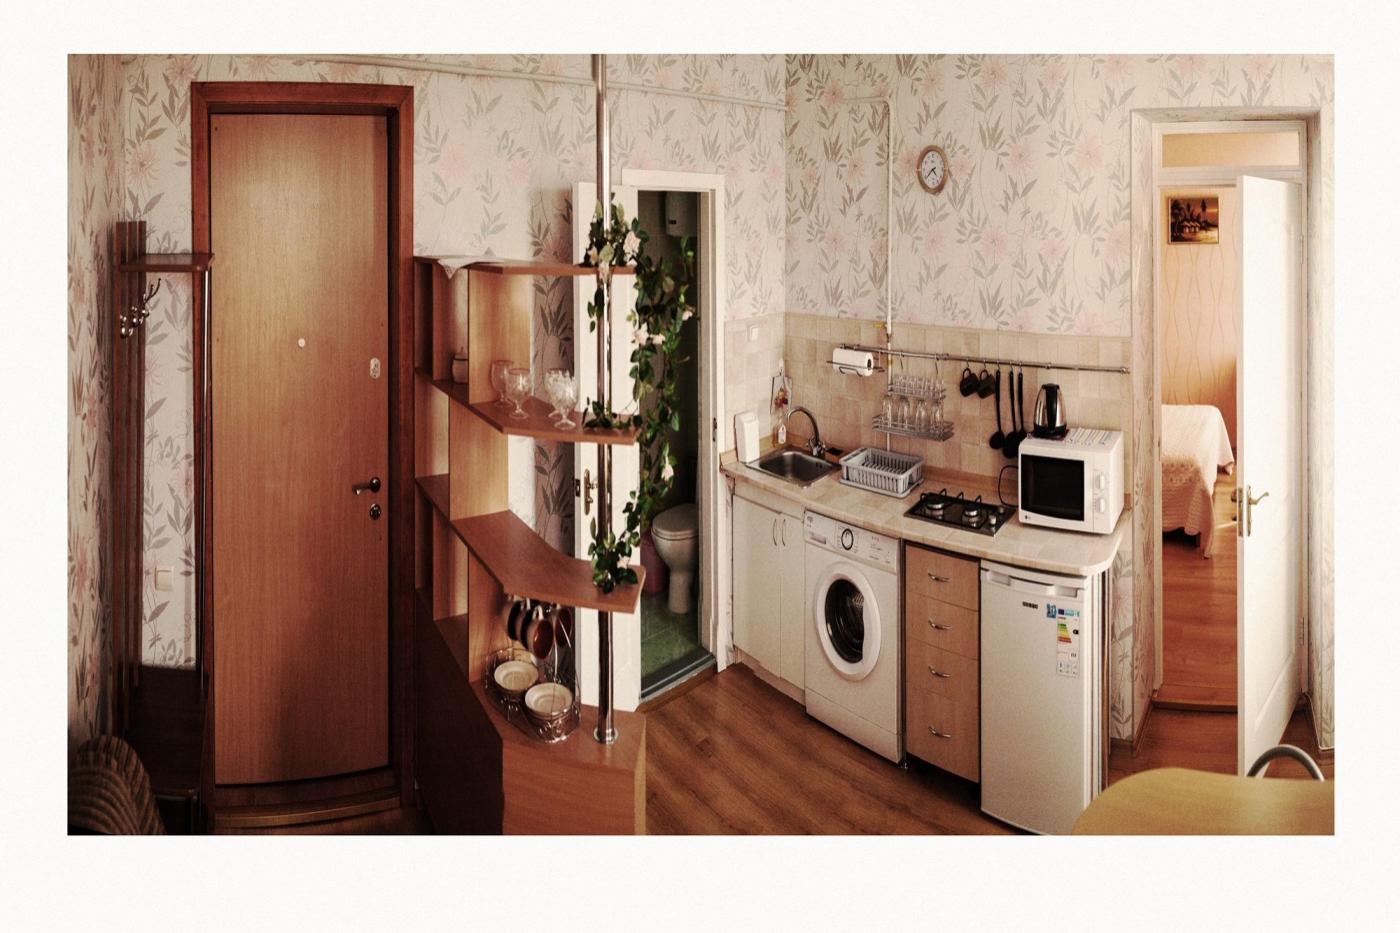 2-комнатная квартира посуточно (вариант № 1536), ул. Воронина улица, фото № 2